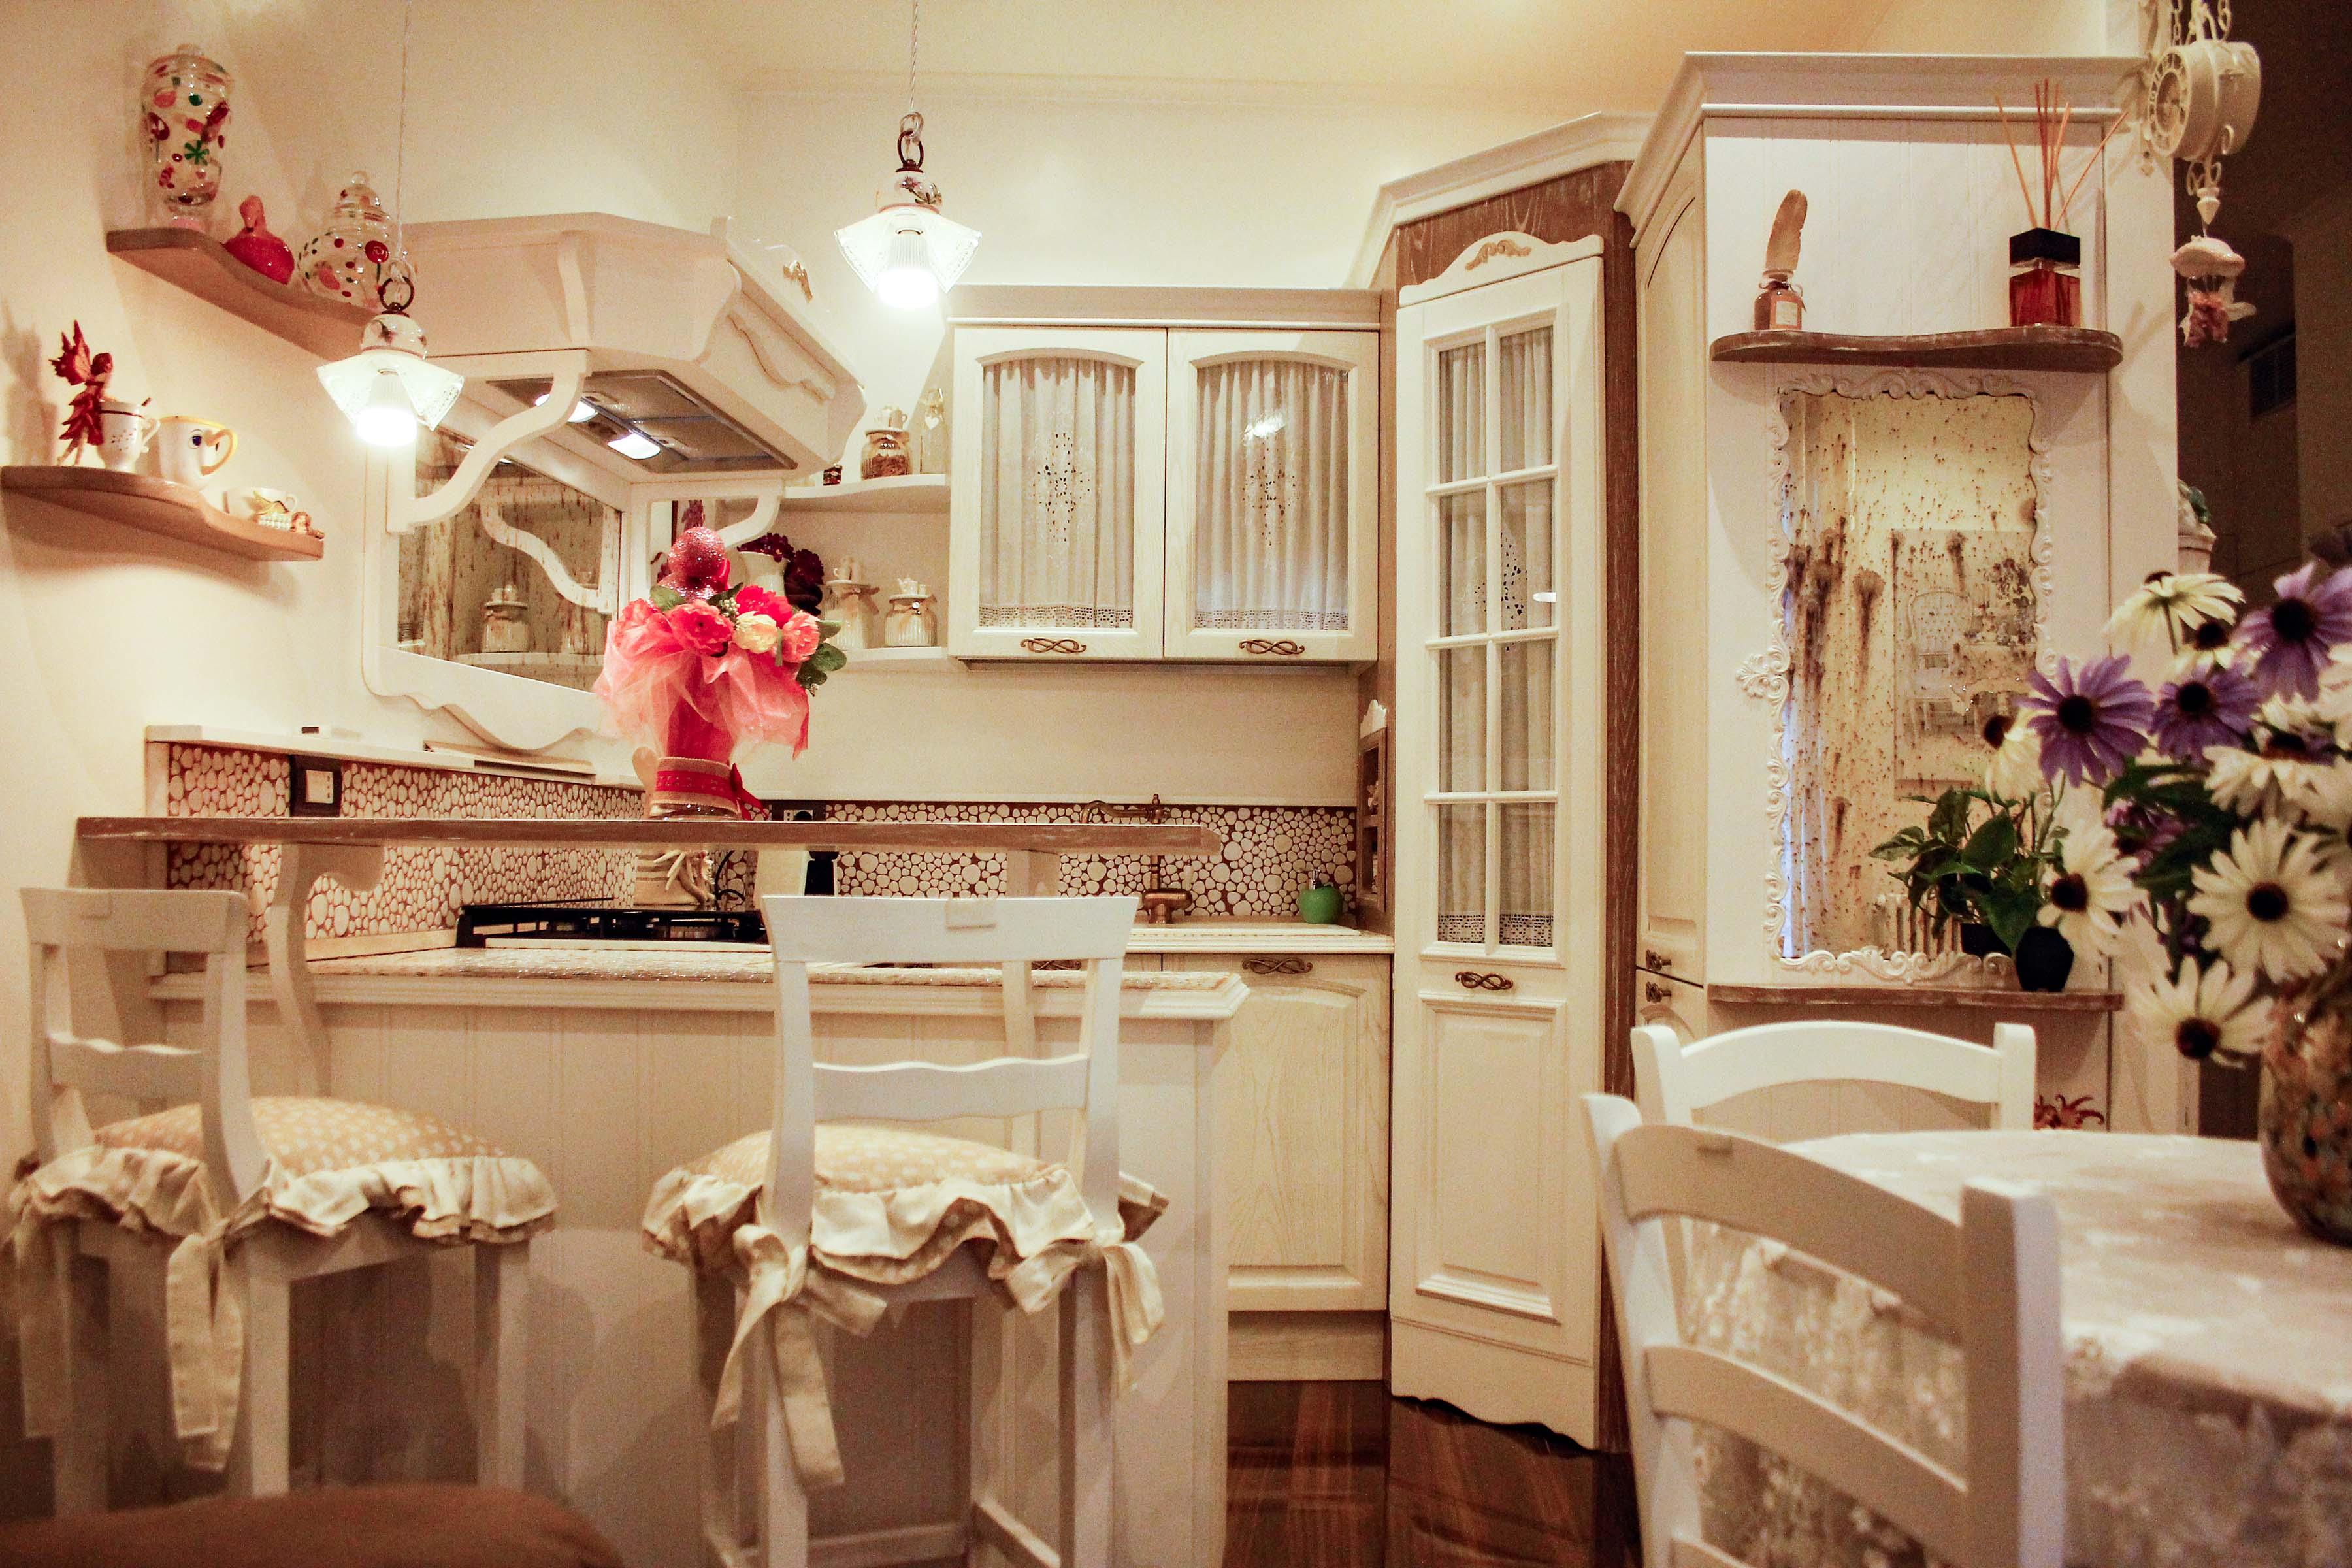 4-cucina shabby chic-su misura-falegname